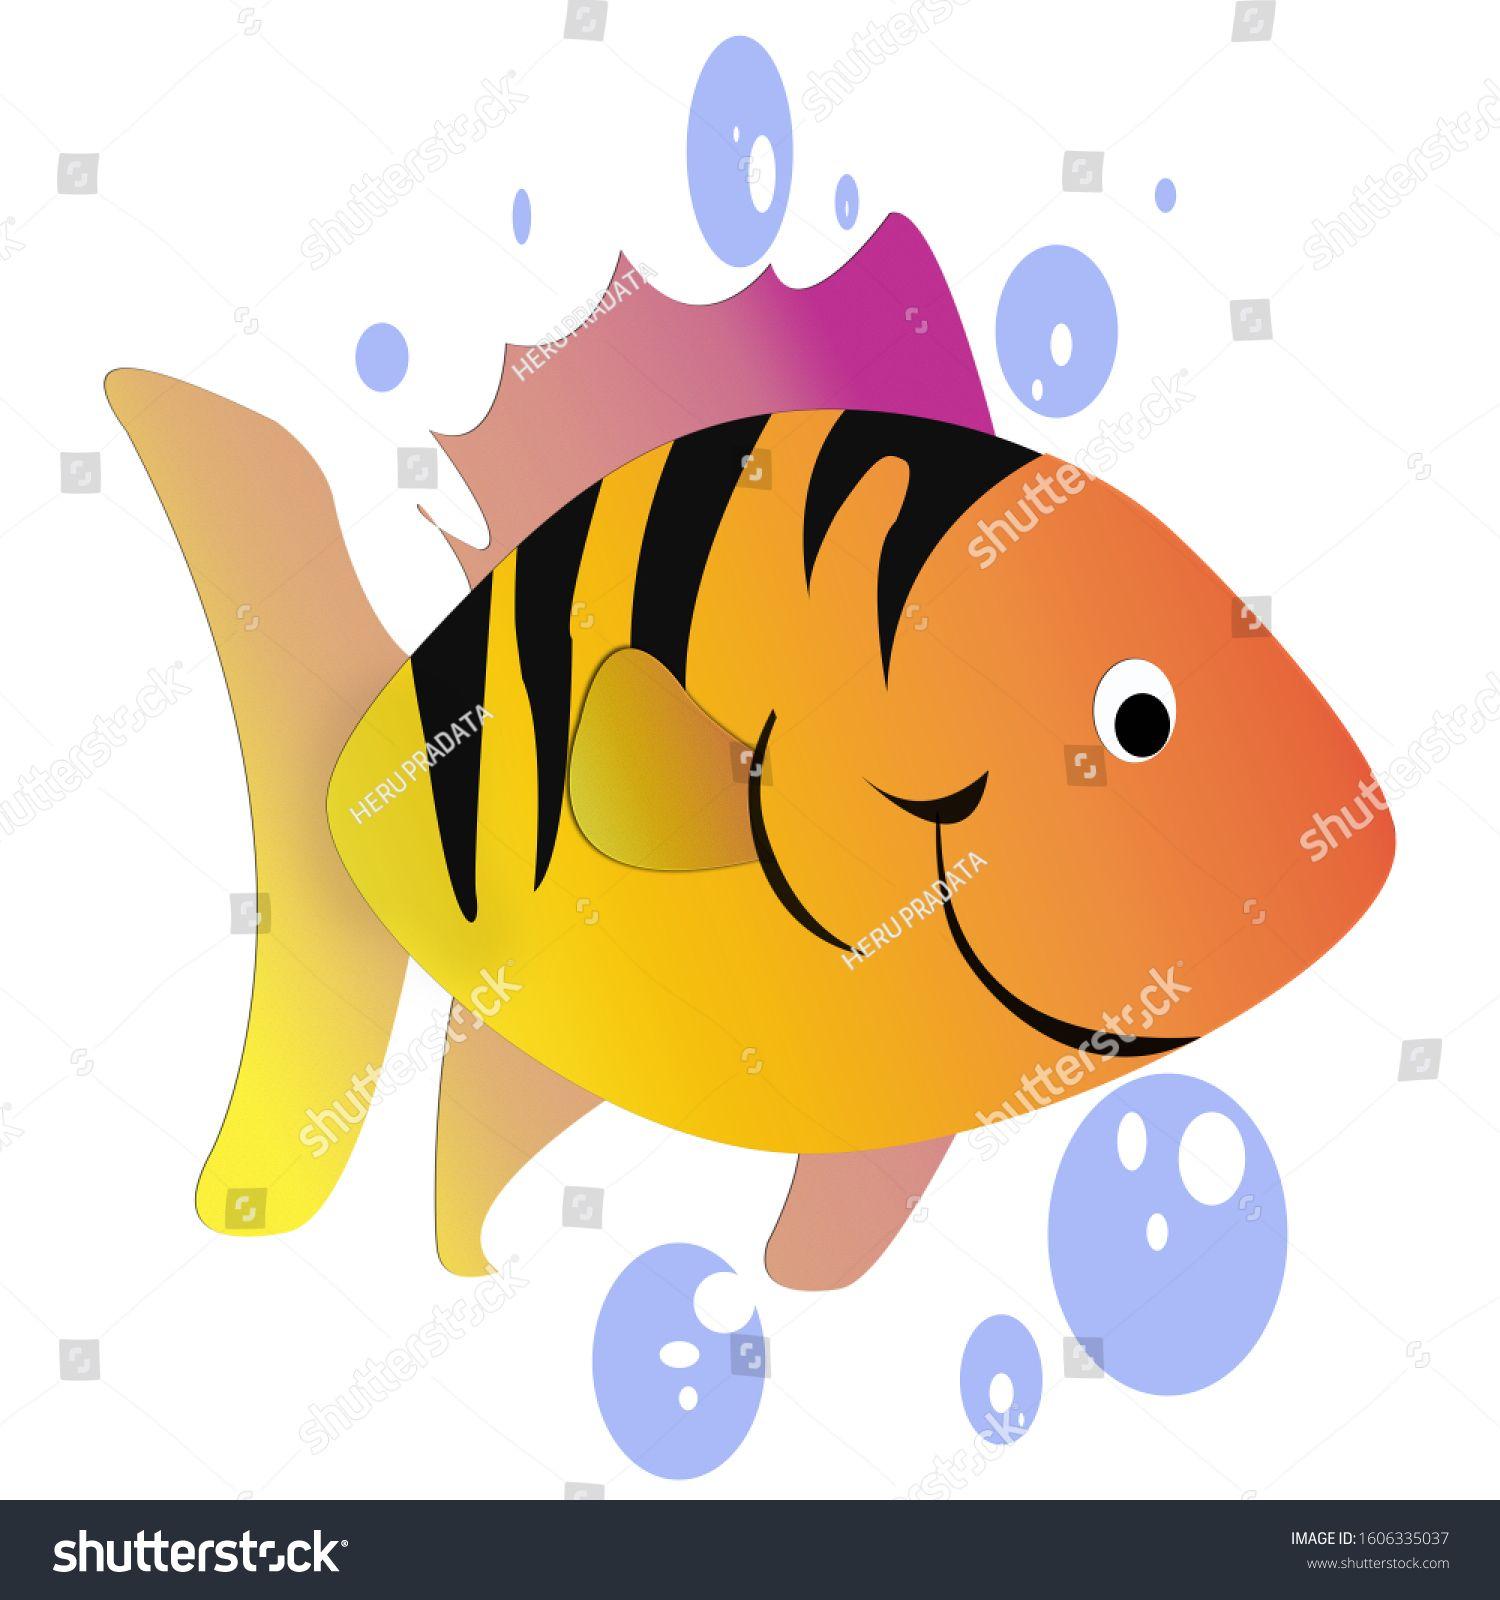 Fish Cartoon Character Sea Animals Clip Art Ad Sponsored Character Cartoon Fish Sea In 2020 Cartoon Fish Sea Animals Cartoon Characters